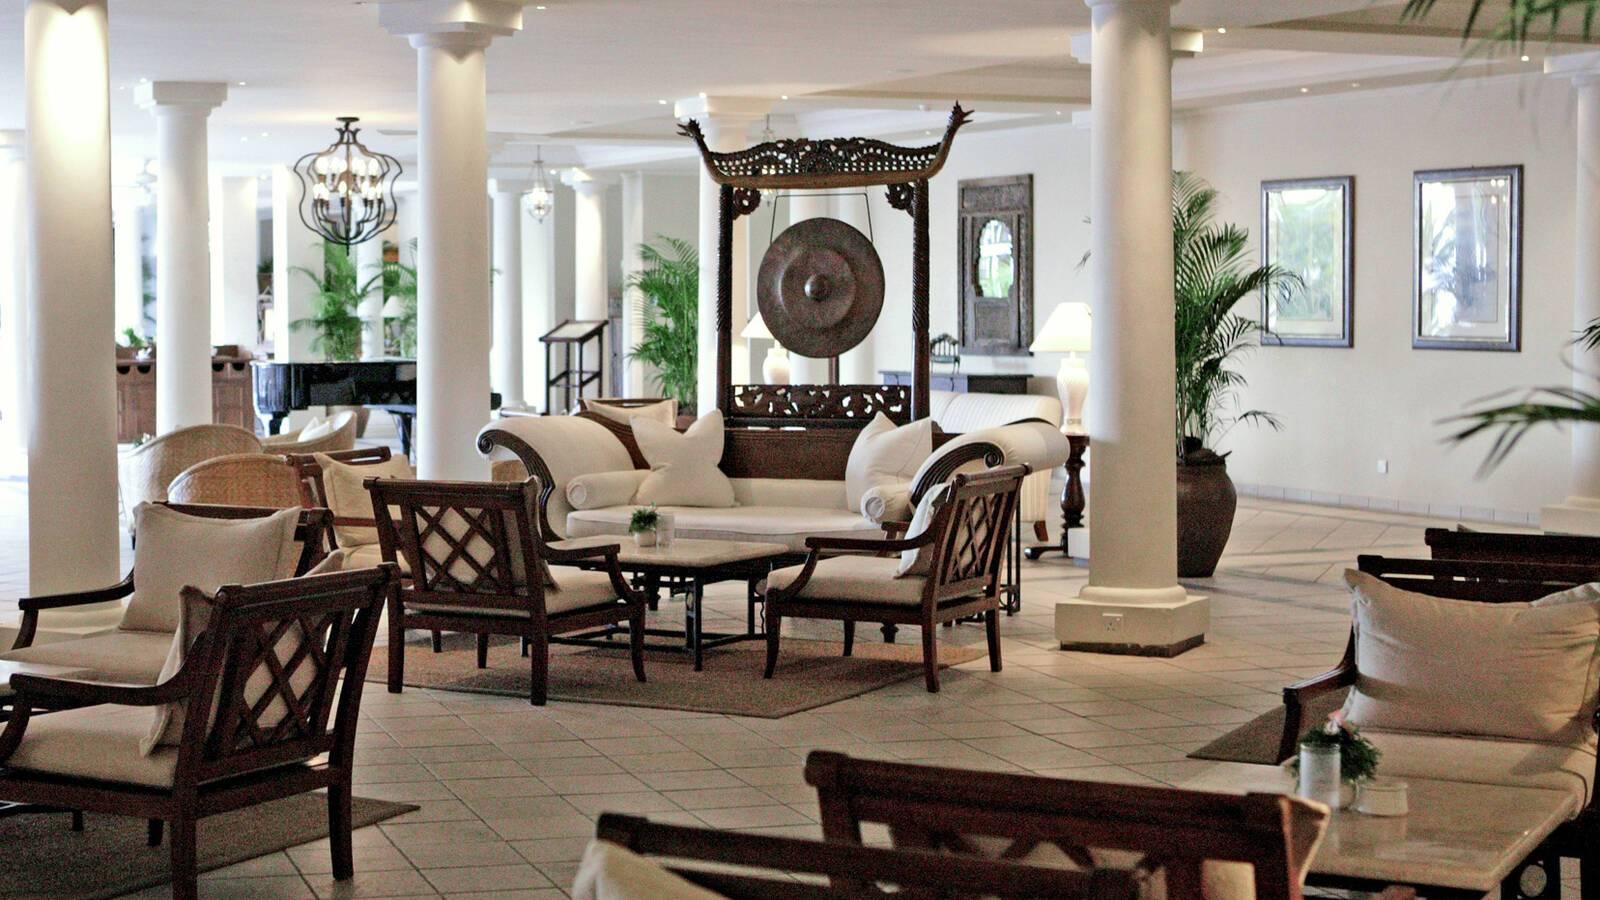 The Residence Mauritius Bar Maurice